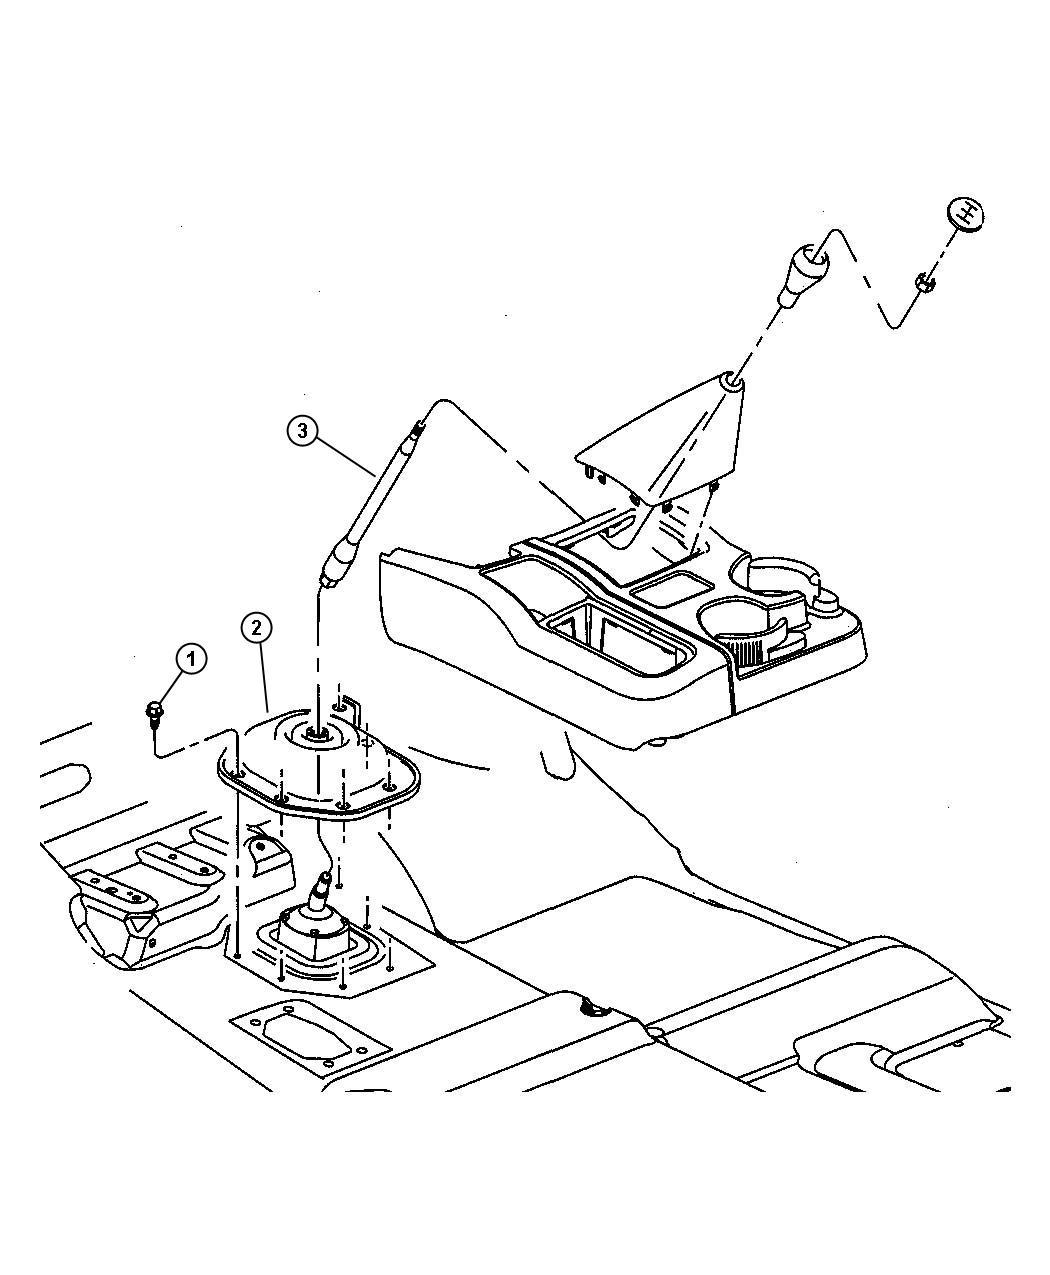 Dodge Ram Lever Gearshift Manual Transmission Floor